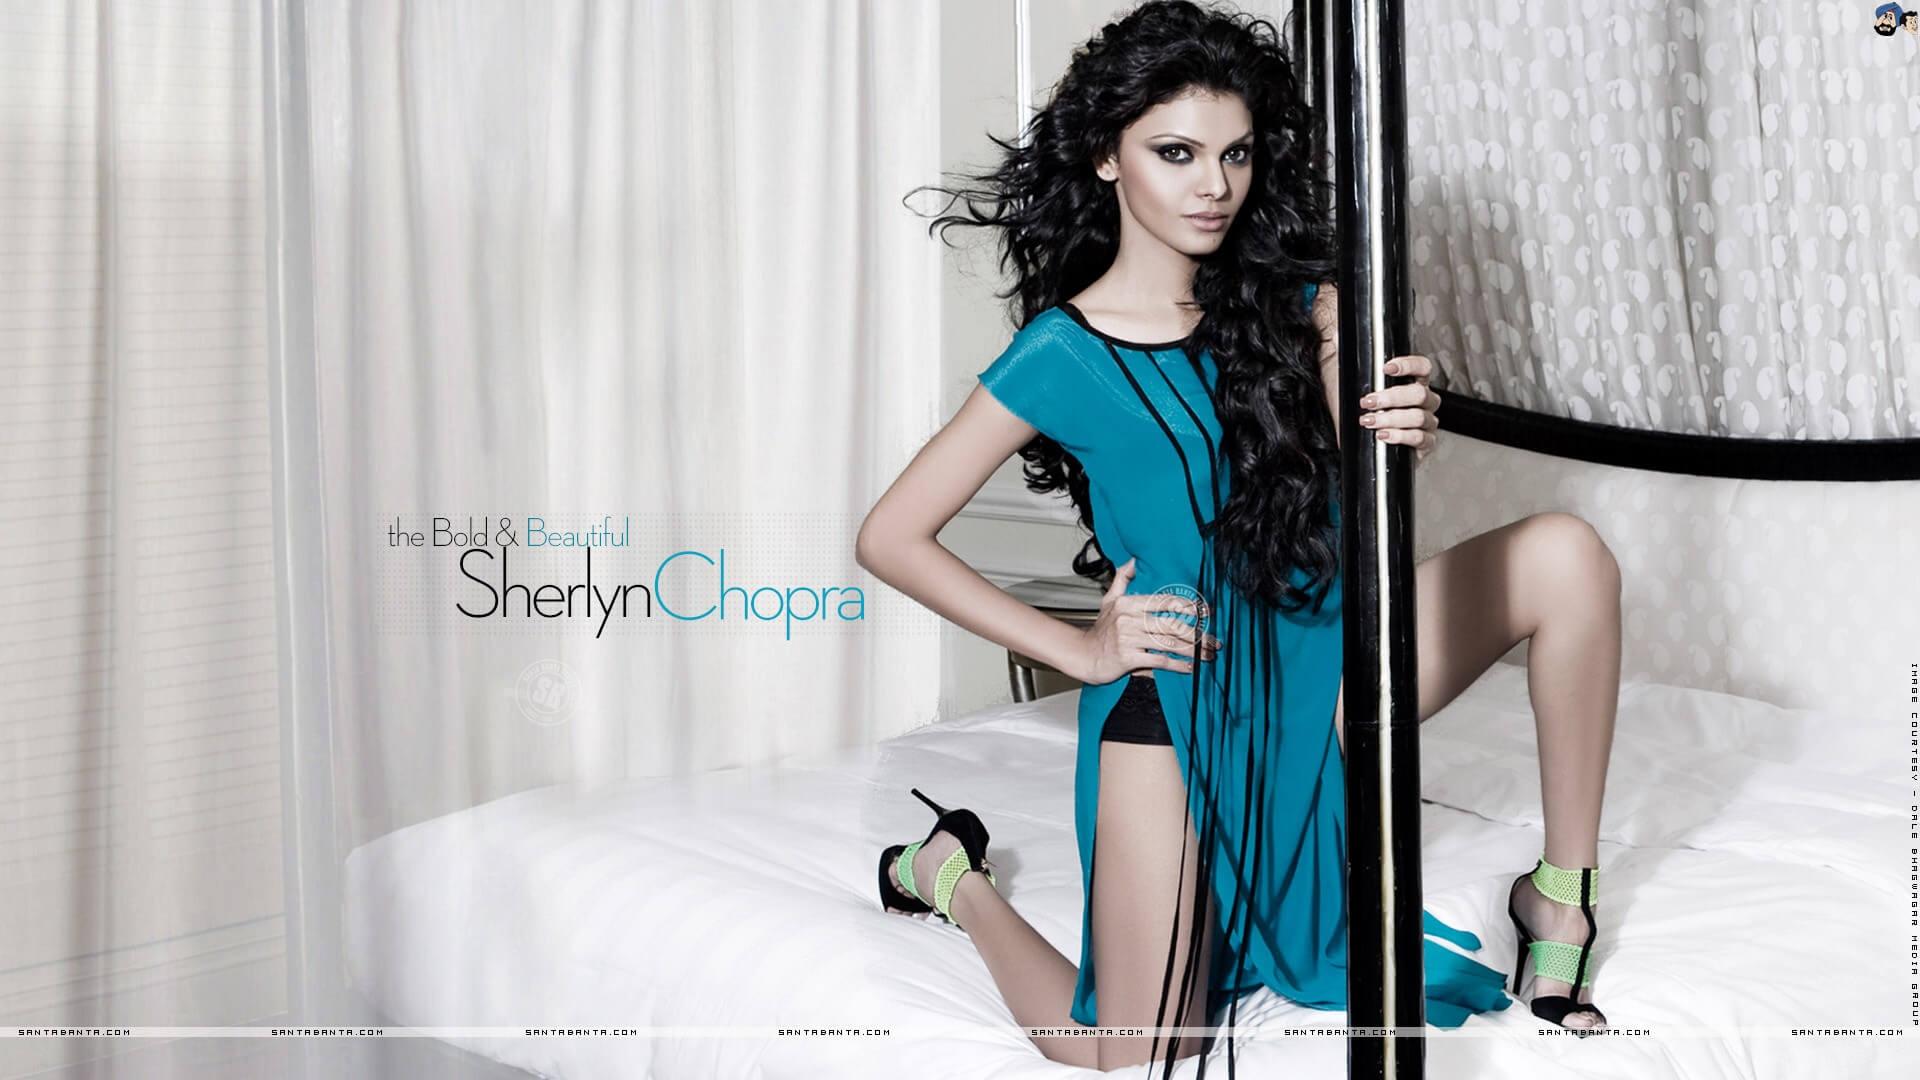 Chopra 3d torrent download sherlyn full movie Kamasutra 3d